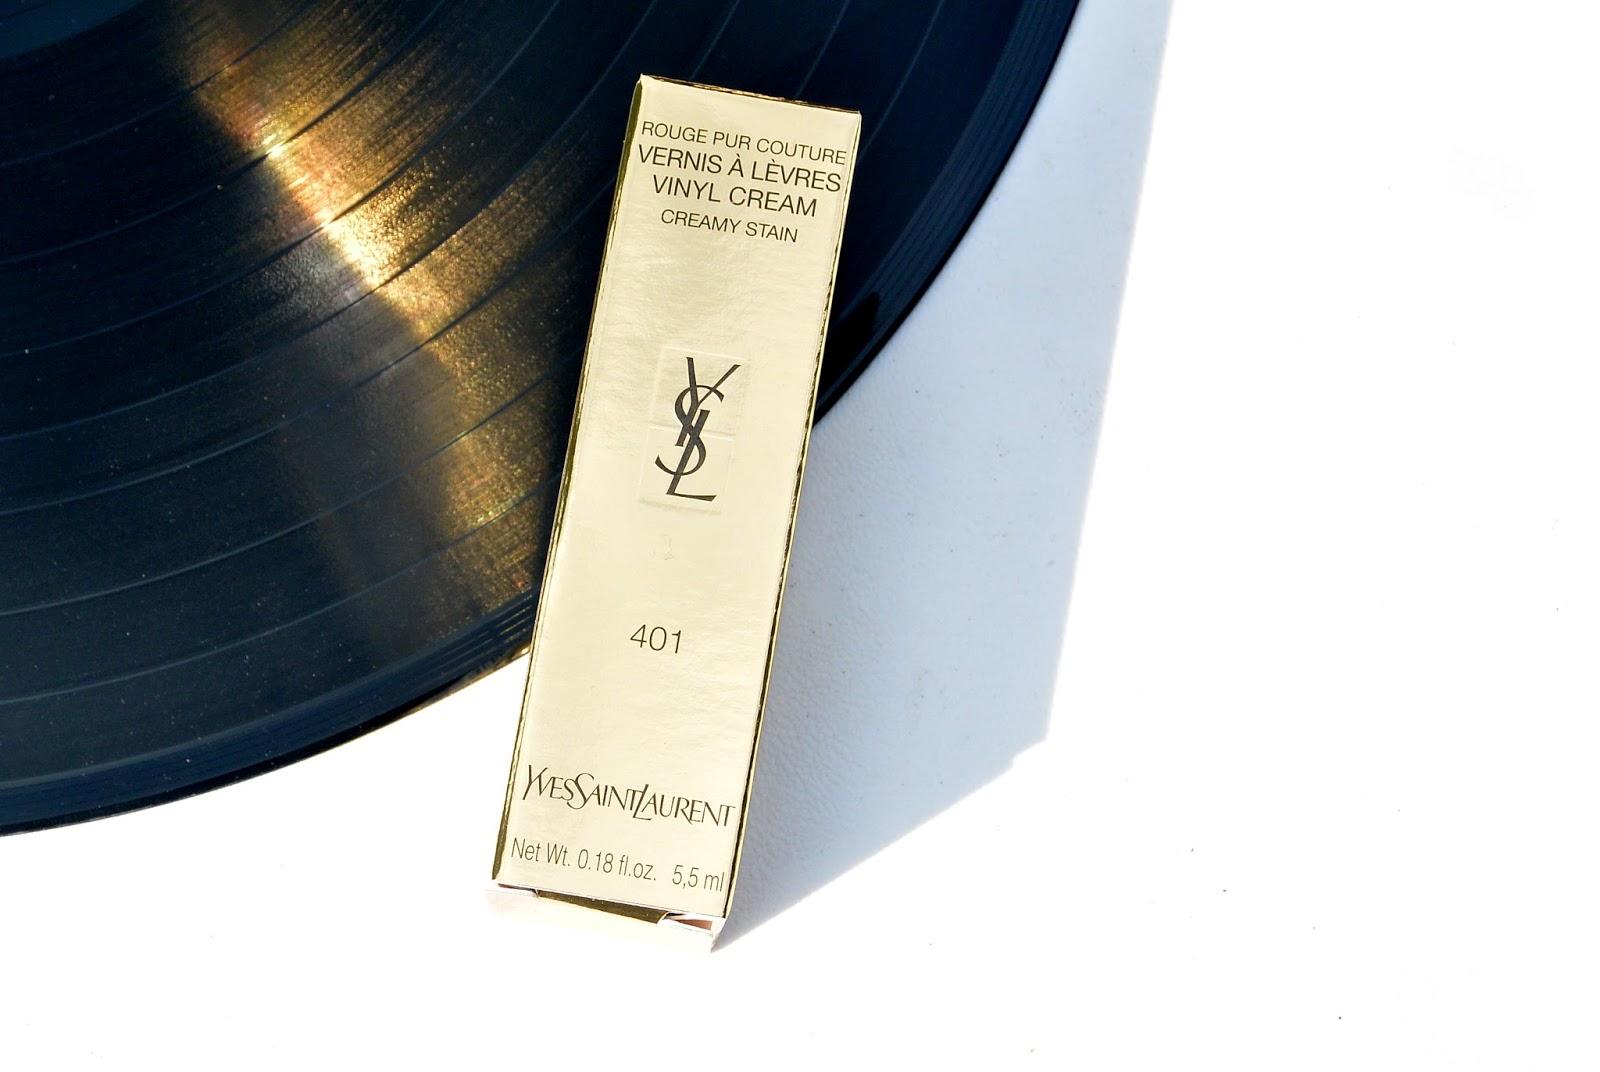 Art This Is Art Yves Saint Laurent Vinyl Cream Lip